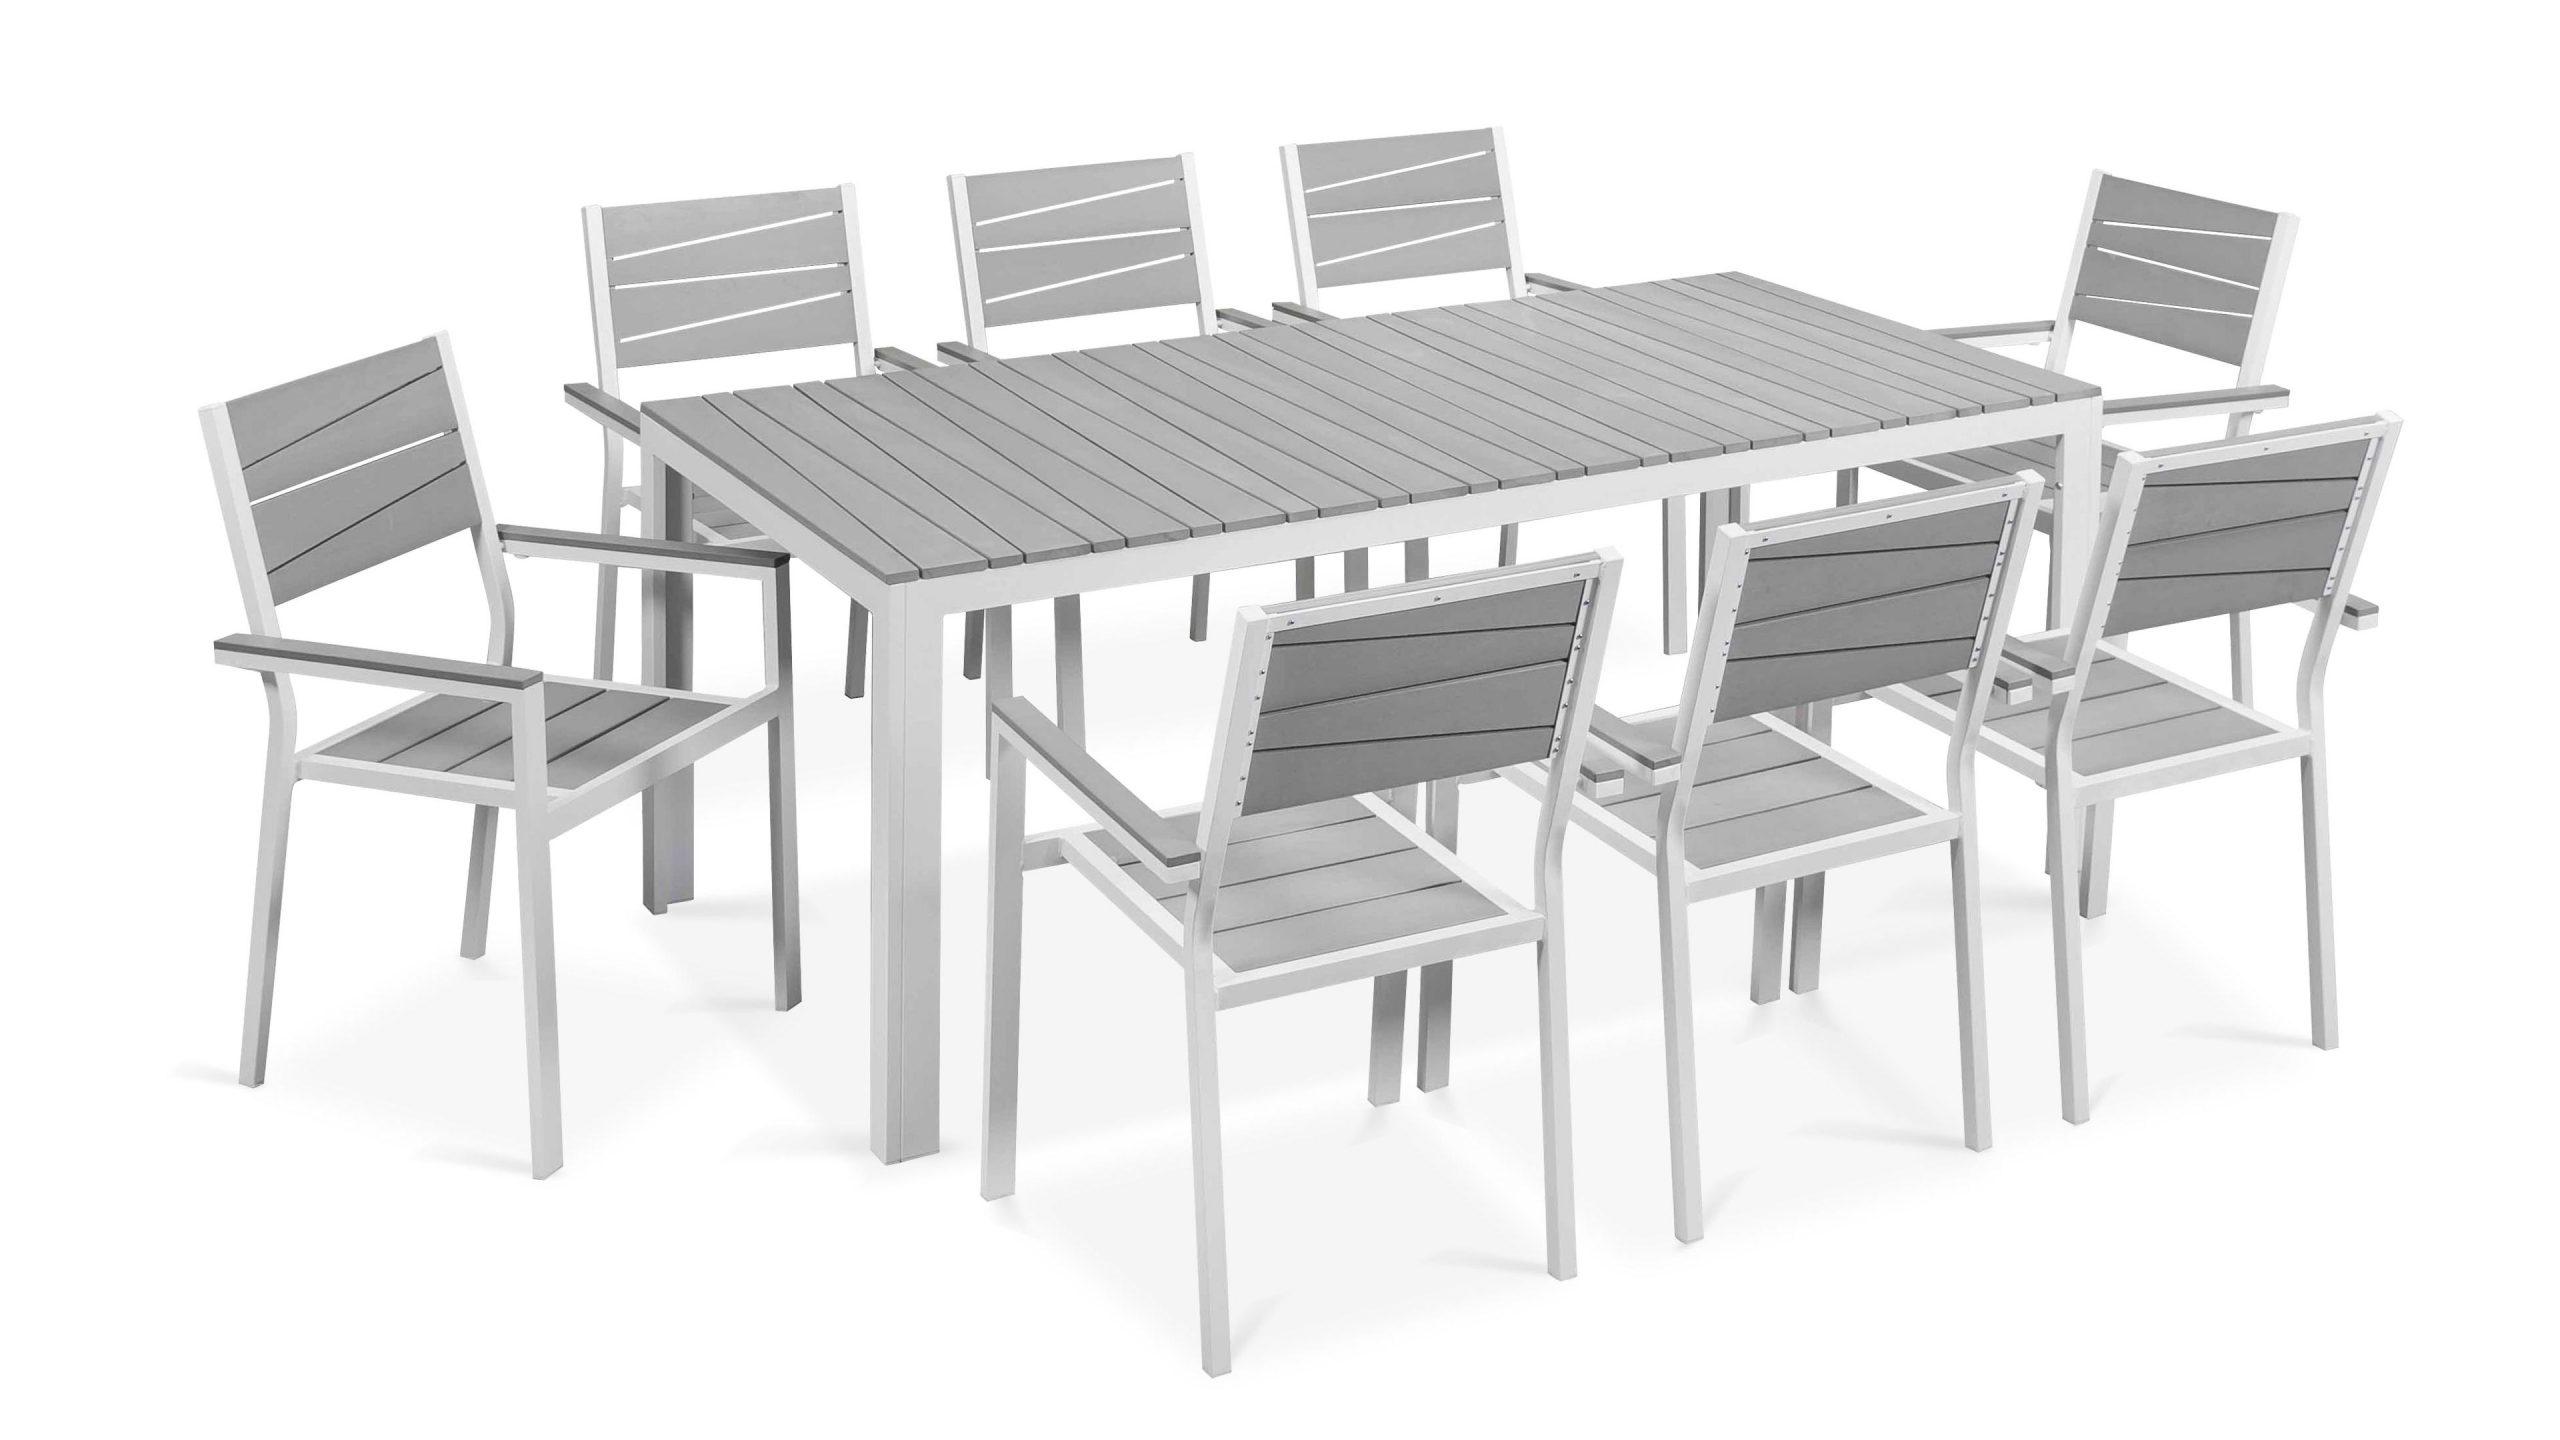 Table De Jardin 8 Places Aluminium Polywood intérieur Table De Jardin Design Pas Cher